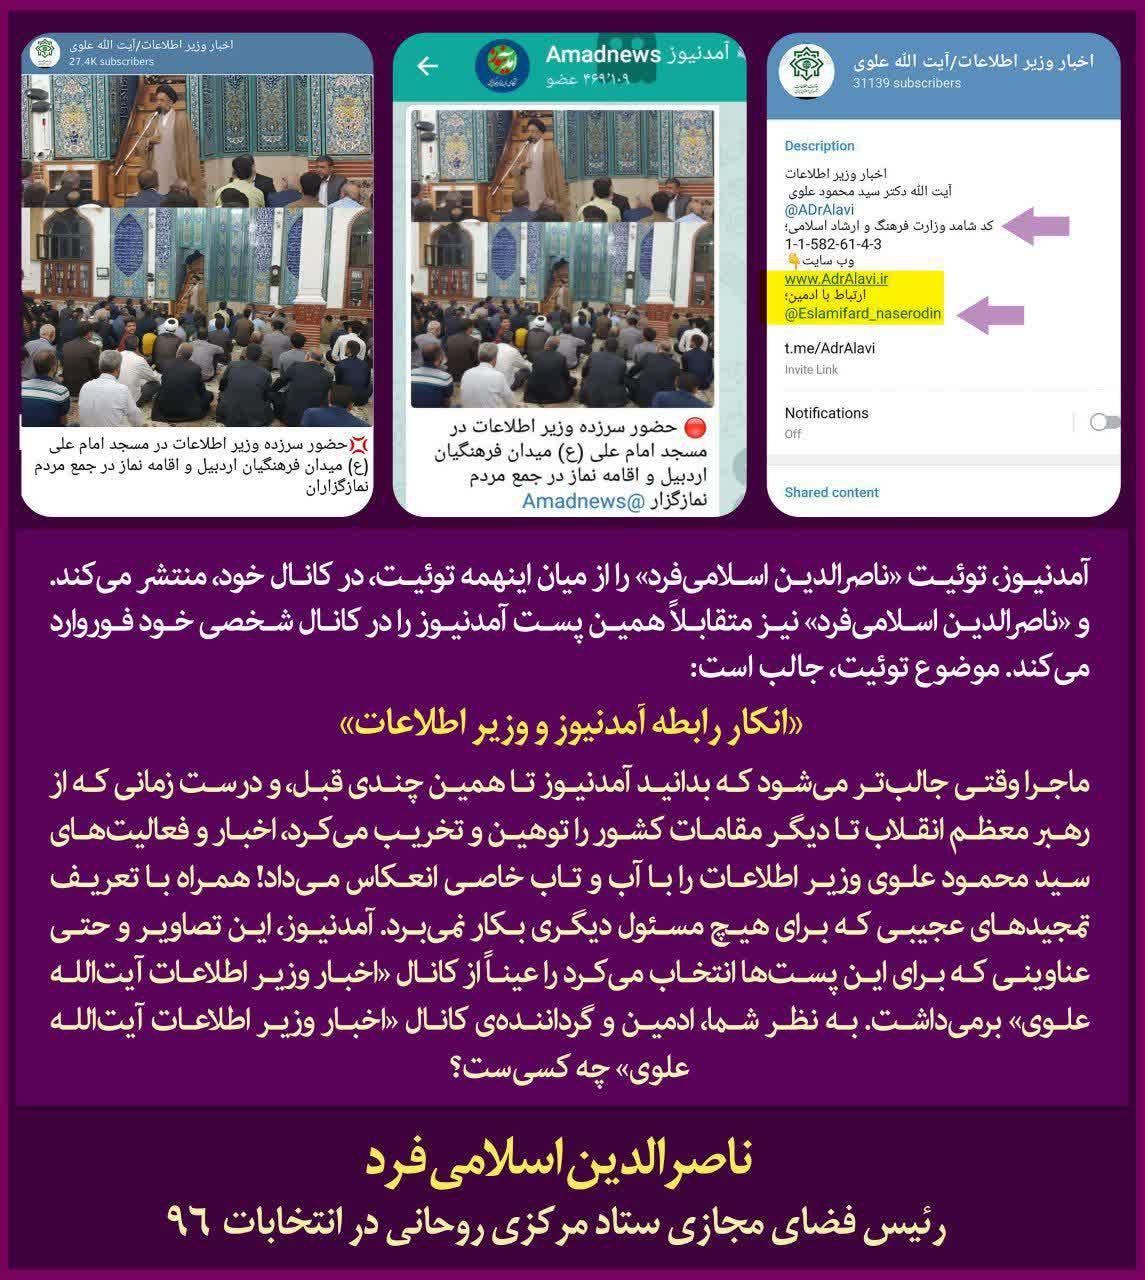 http://dl-abbasi.ir/yekta/1398/Graphic/eslamifard/eslamifard%20(8).jpg